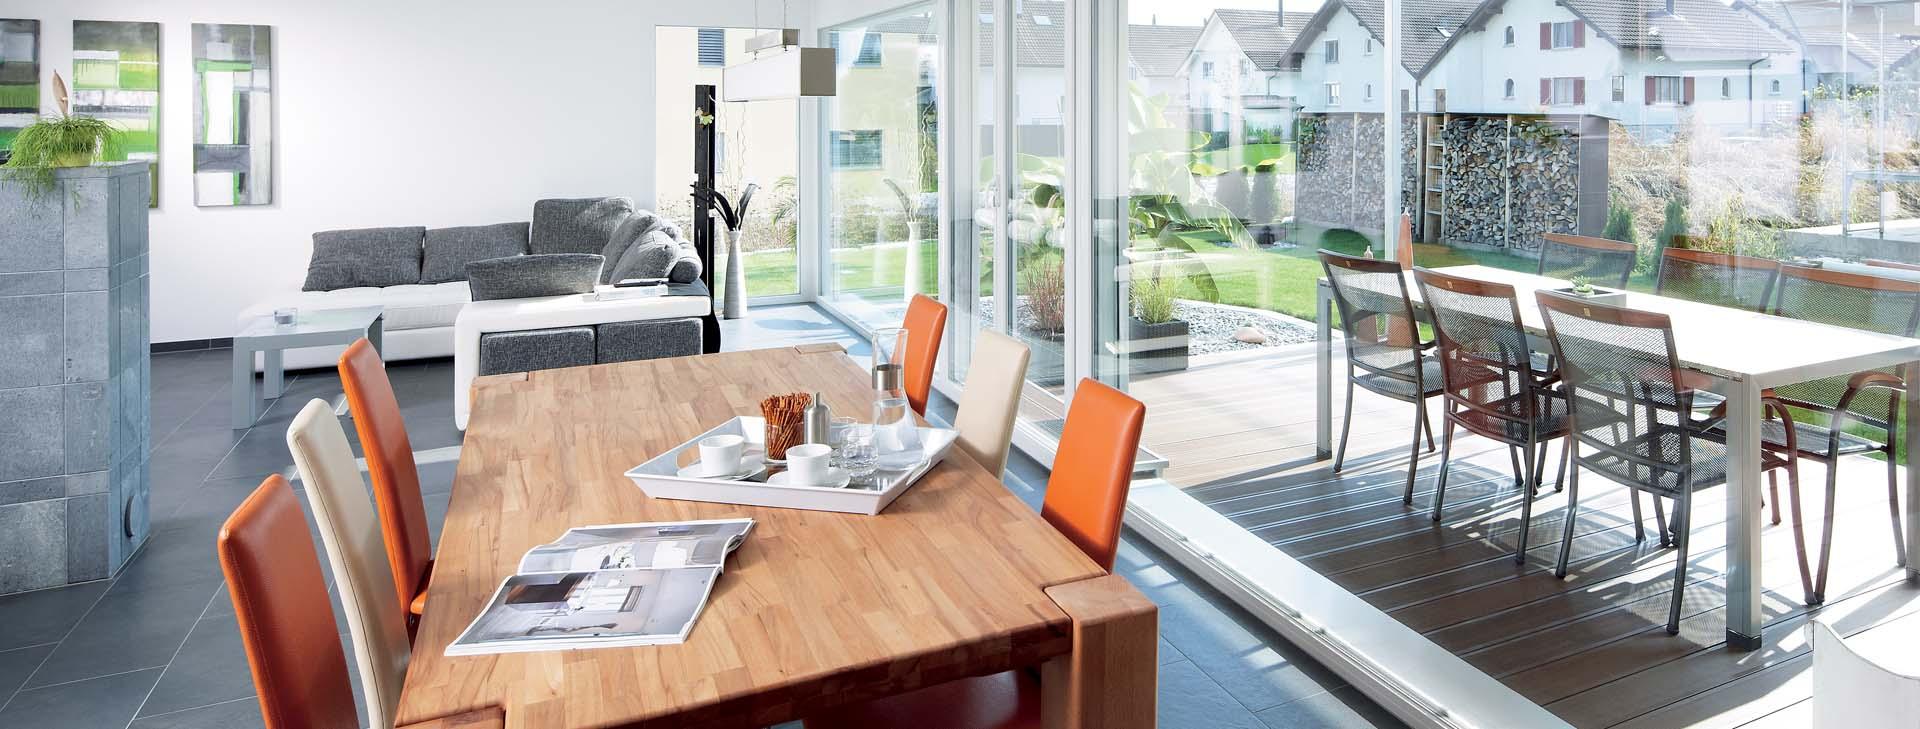 holzfenster metallfenster renovationsfenster t ren und reparaturen de. Black Bedroom Furniture Sets. Home Design Ideas